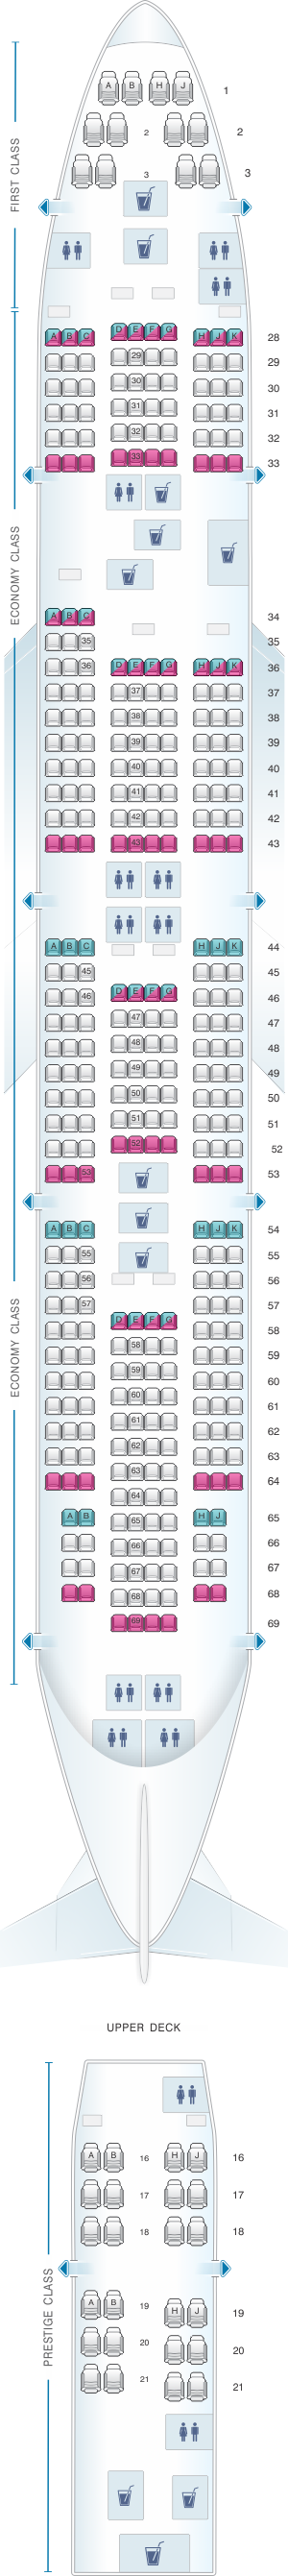 Seat map for Korean Air Boeing B747 400 404PAX